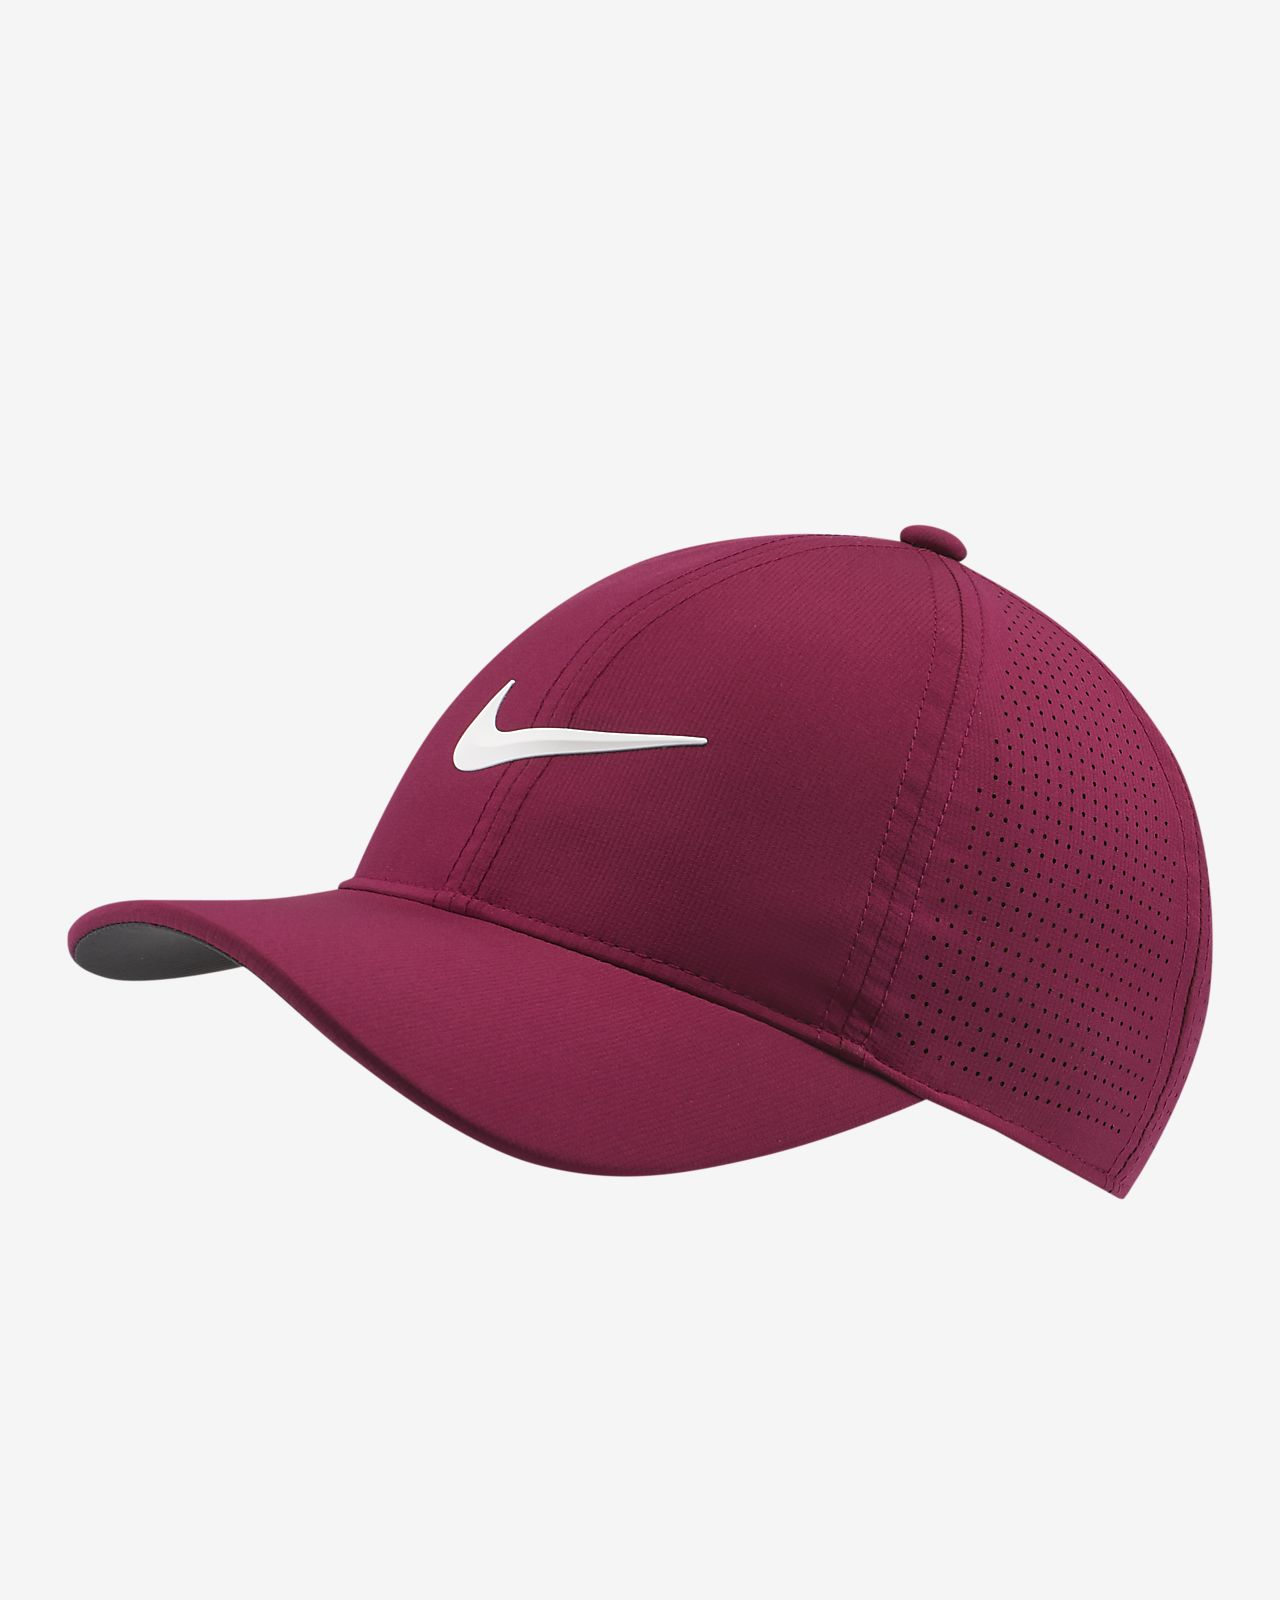 e6dbffffb3f70 Nike AeroBill Legacy91 Women s Golf Hat. Nike.com